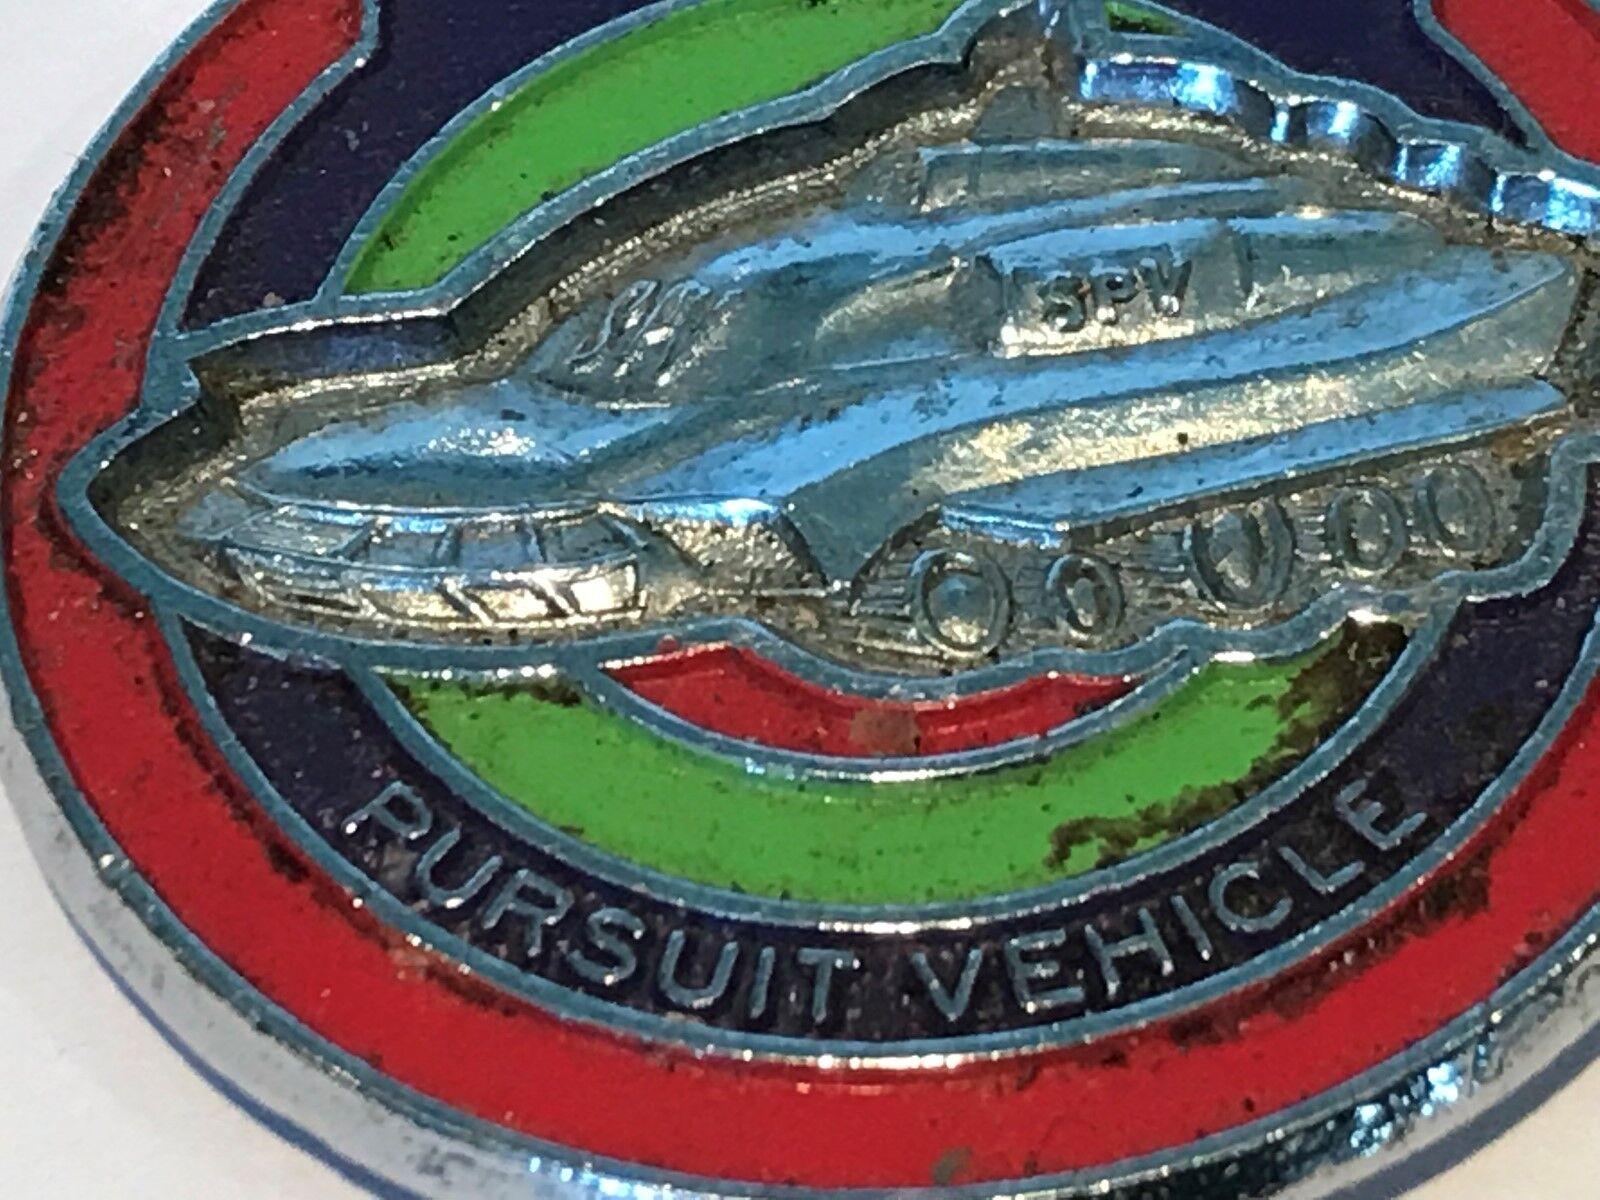 RARE RARE RARE ORIGINAL CAPTAIN SCARLET PURSUIT VEHICLE  PIN BADGE 12d9a6